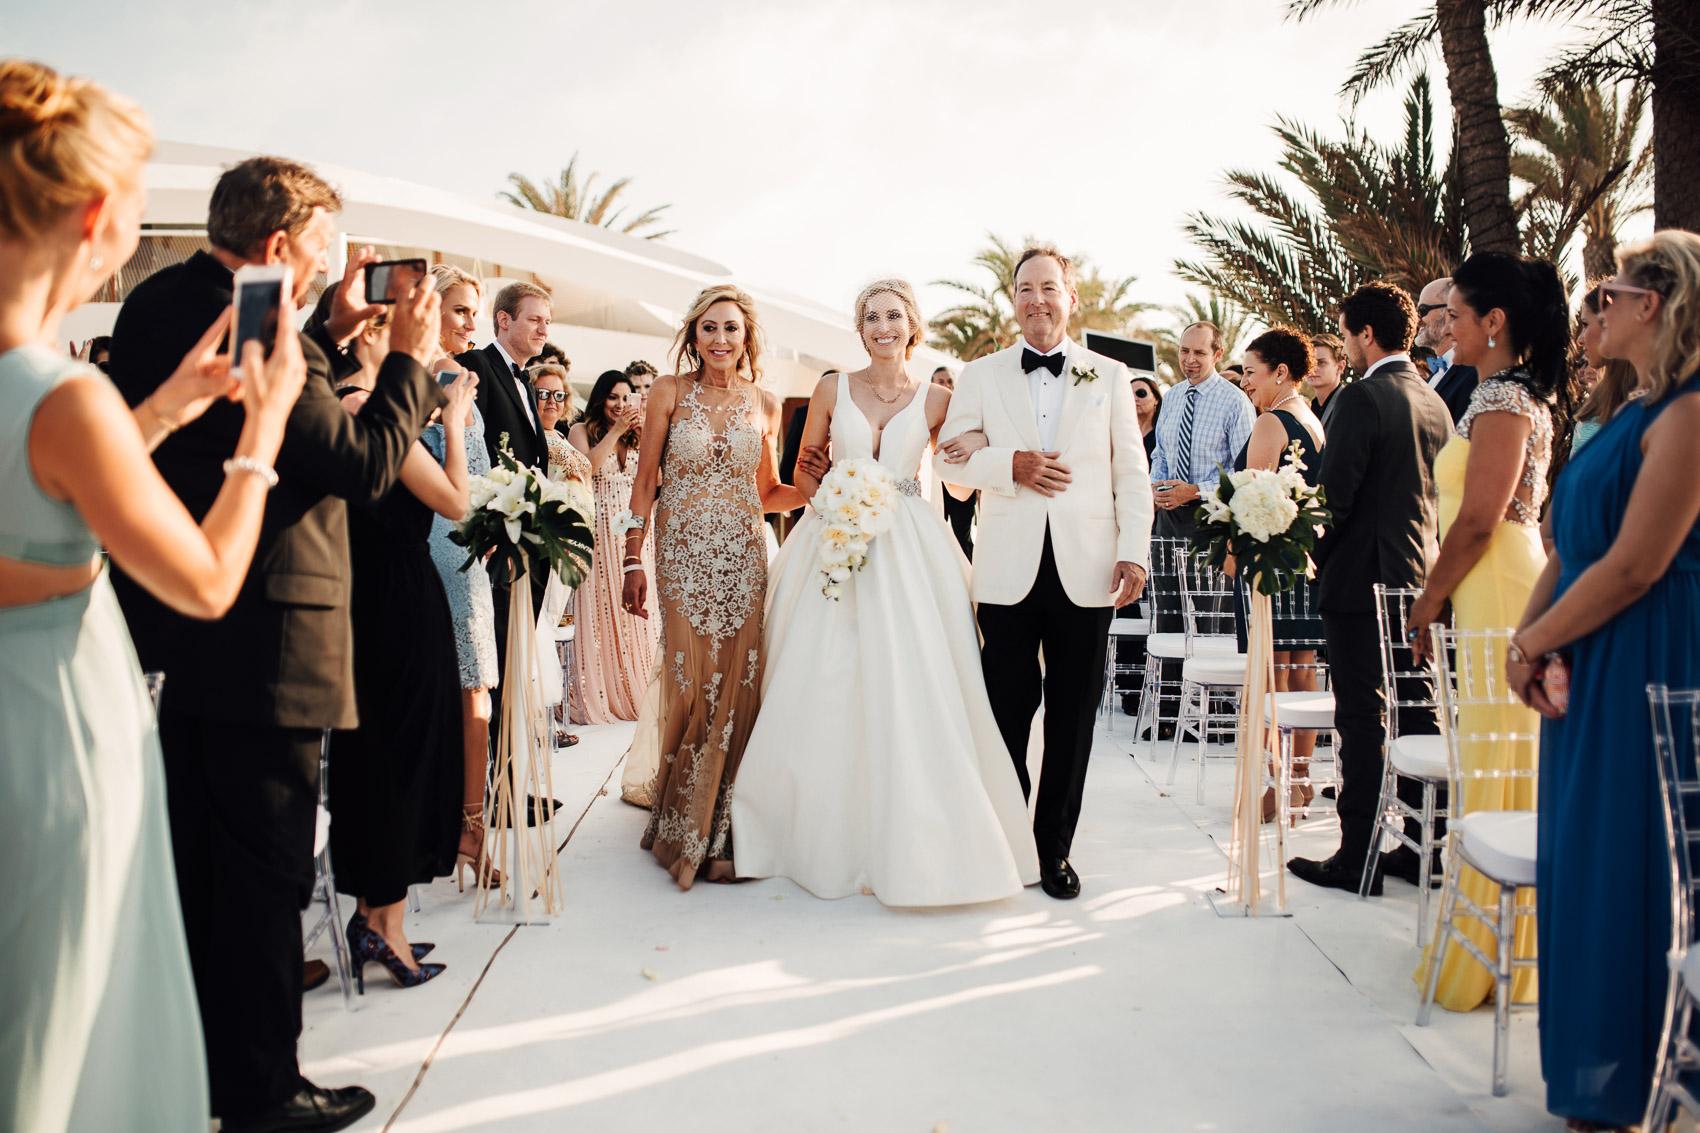 ceremonia novia padrinos invitados